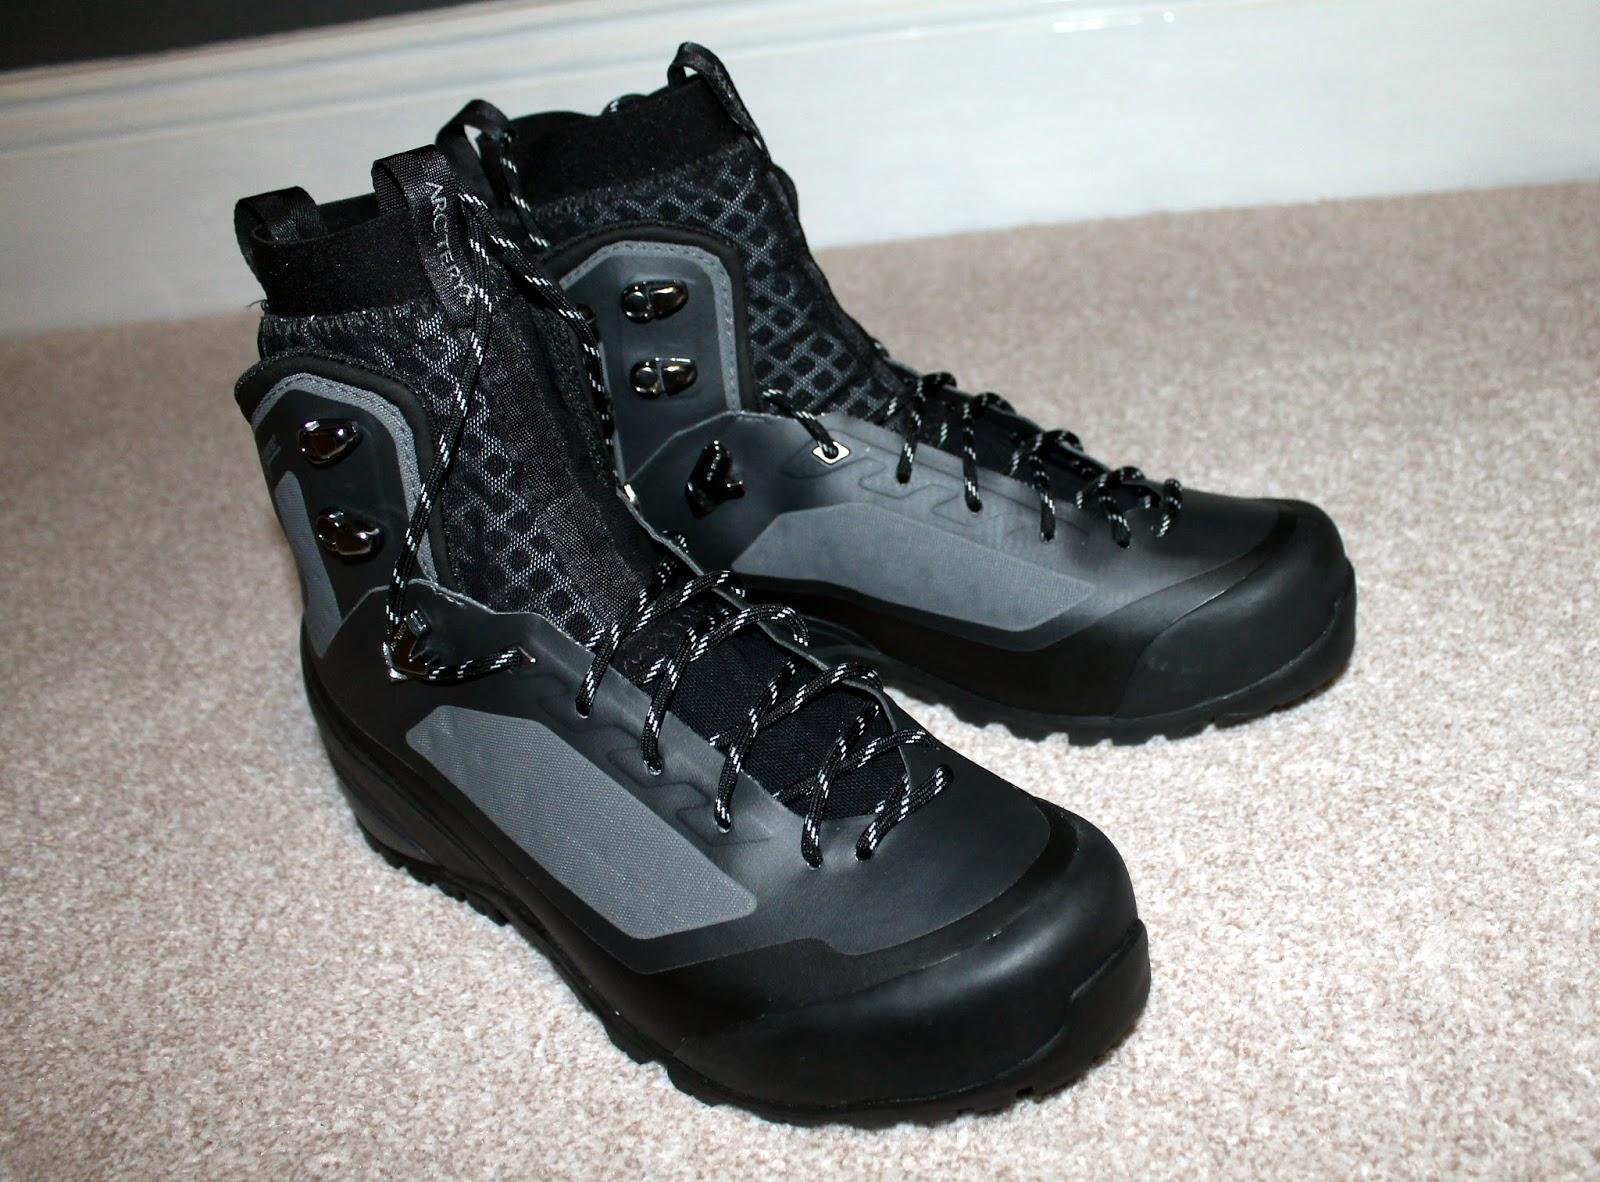 fdbb1ac0a0 All The Gear But No Idea: First Look: Arc'teryx Bora Mid GTX Hiking Boot